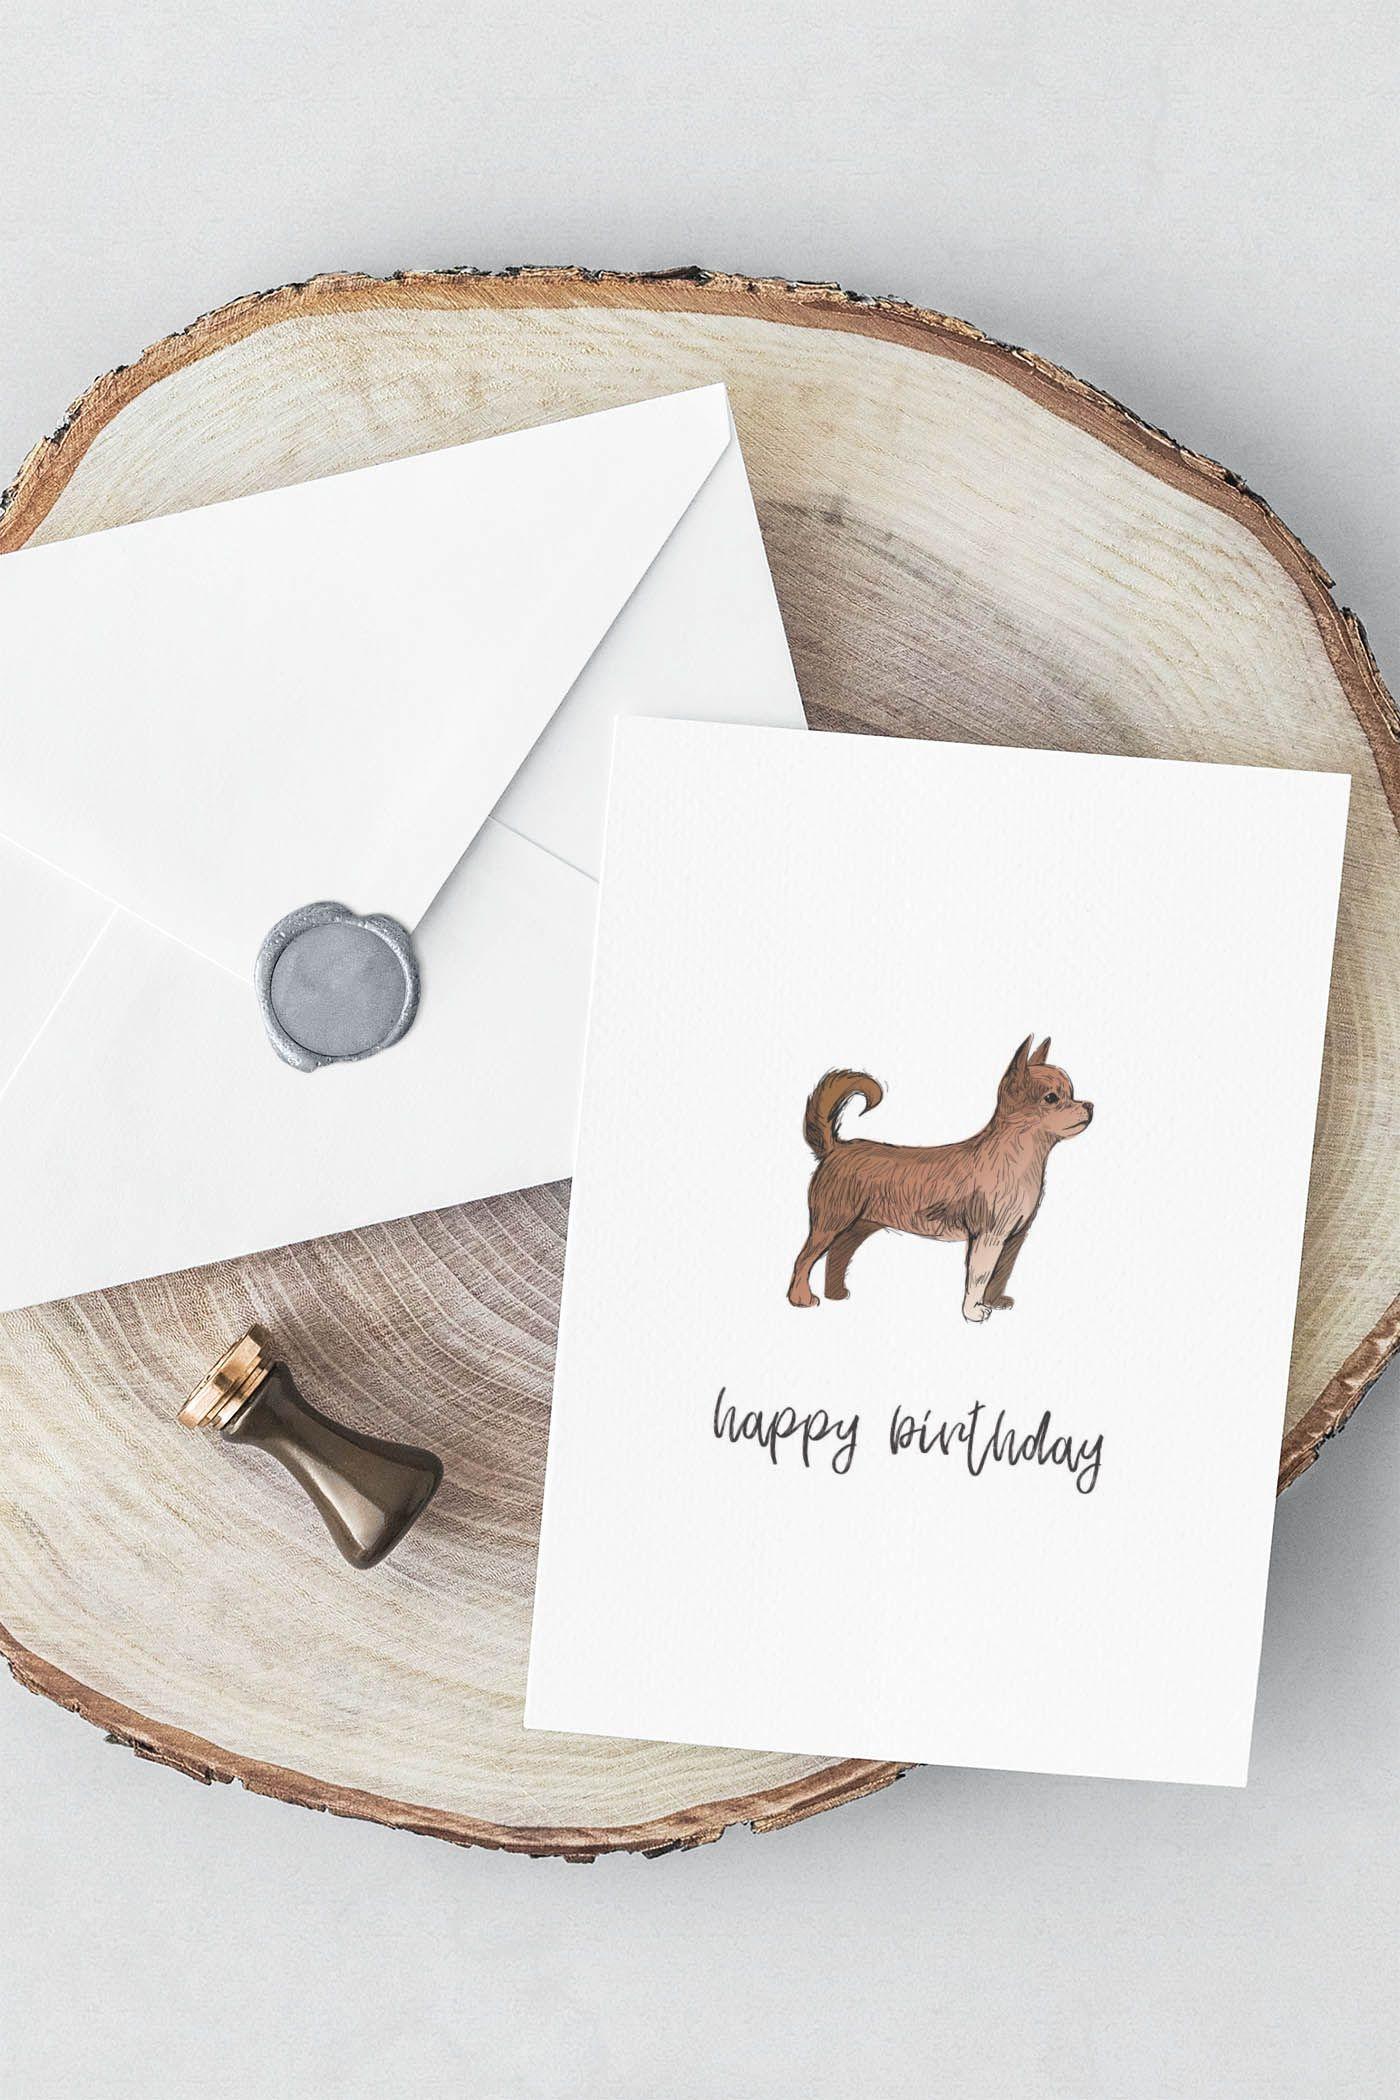 22 Free Printable Dog Birthday Cards | Pin Crazy | Dog Birthday - Free Printable Pug Birthday Cards